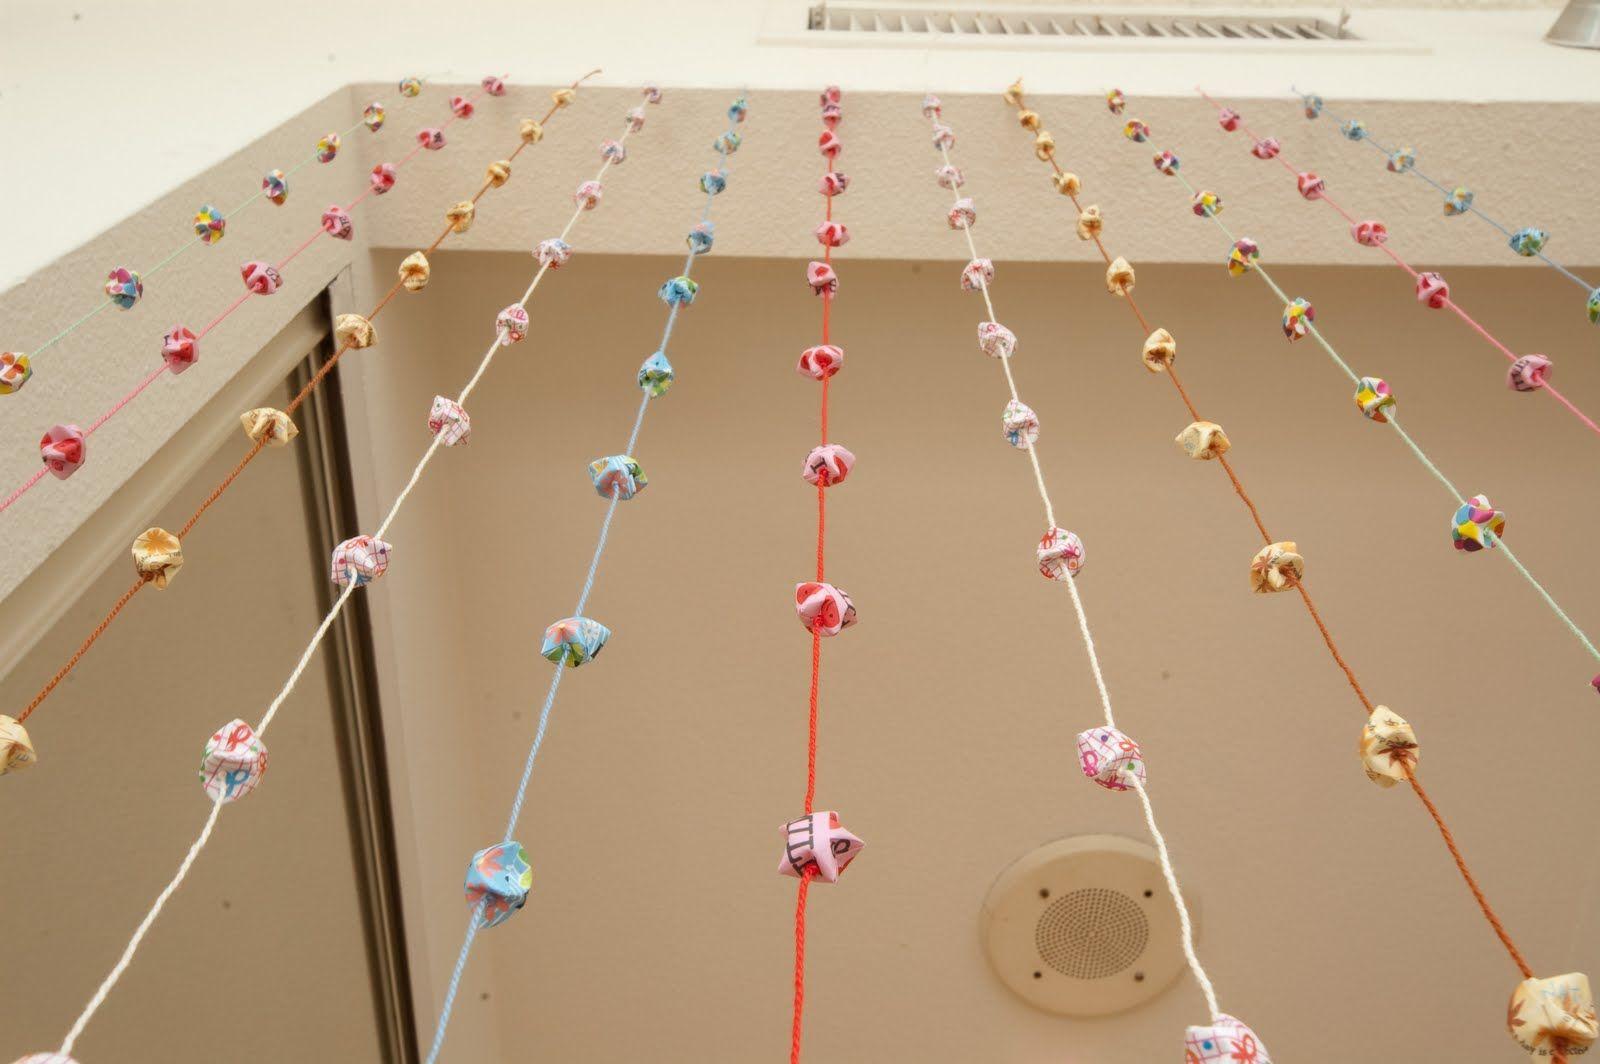 meowmiix: Origami Stars Door Curtain DIY | DIY, Crafts ... - photo#11